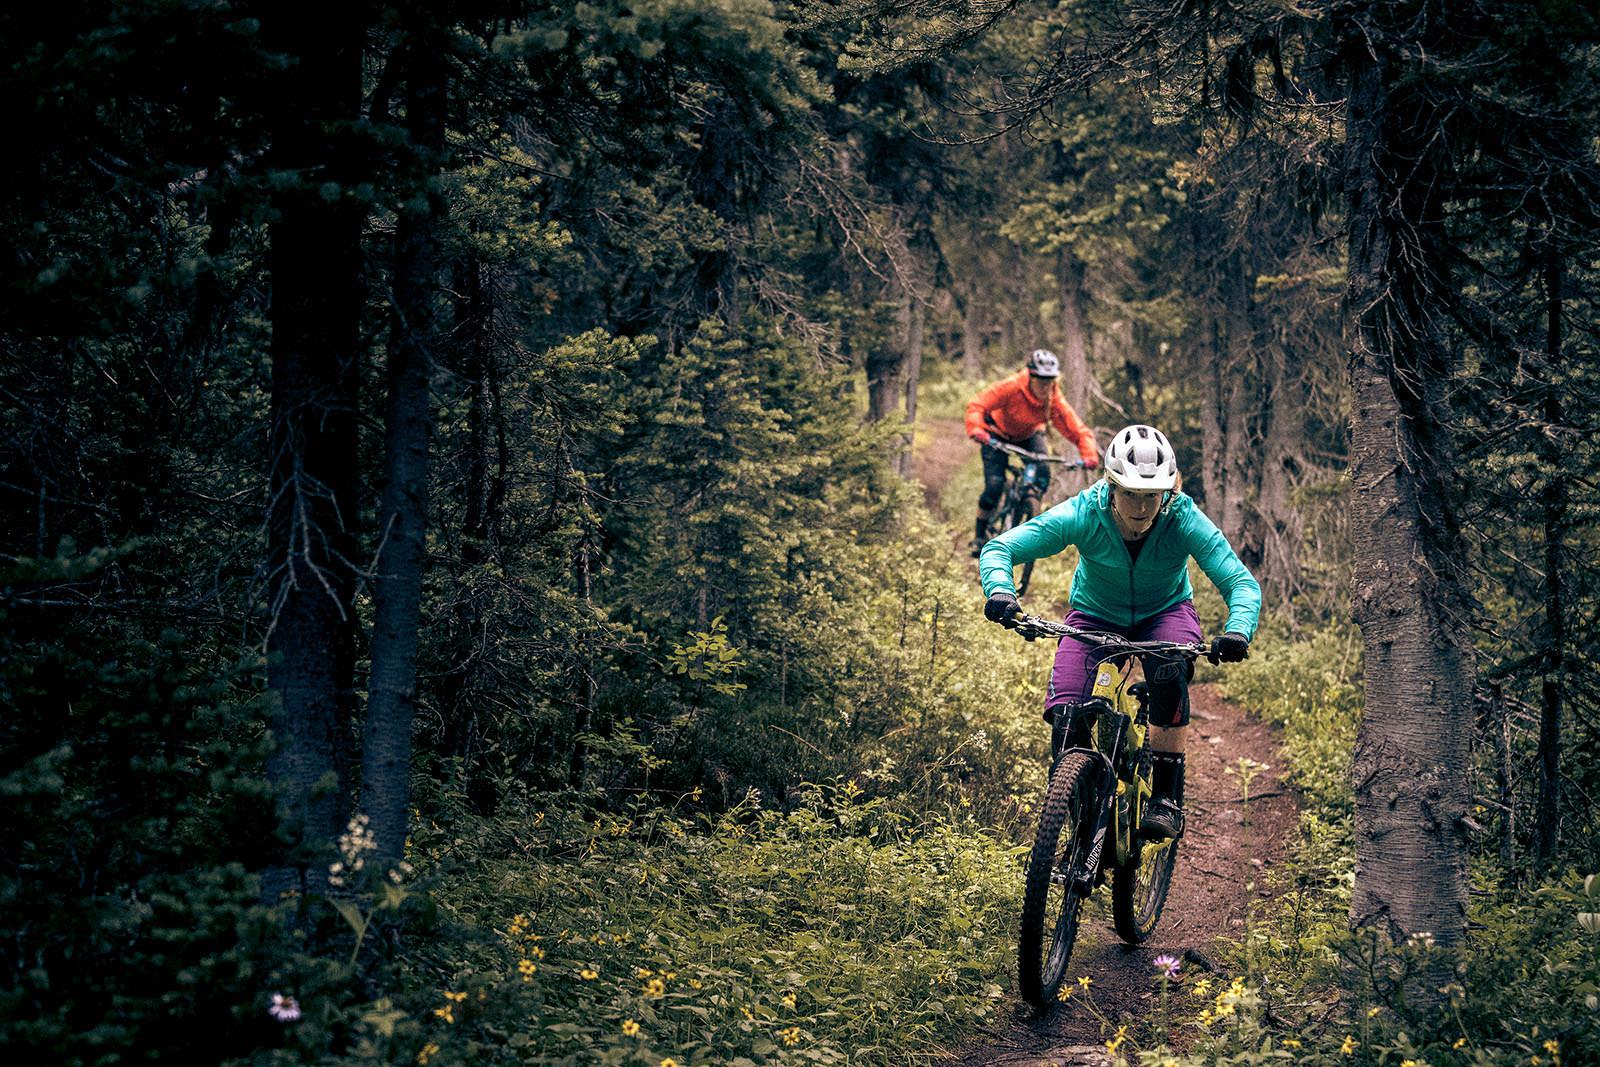 Juliana Bicycles - Sarah and Britt Phelan in Smithers, BC